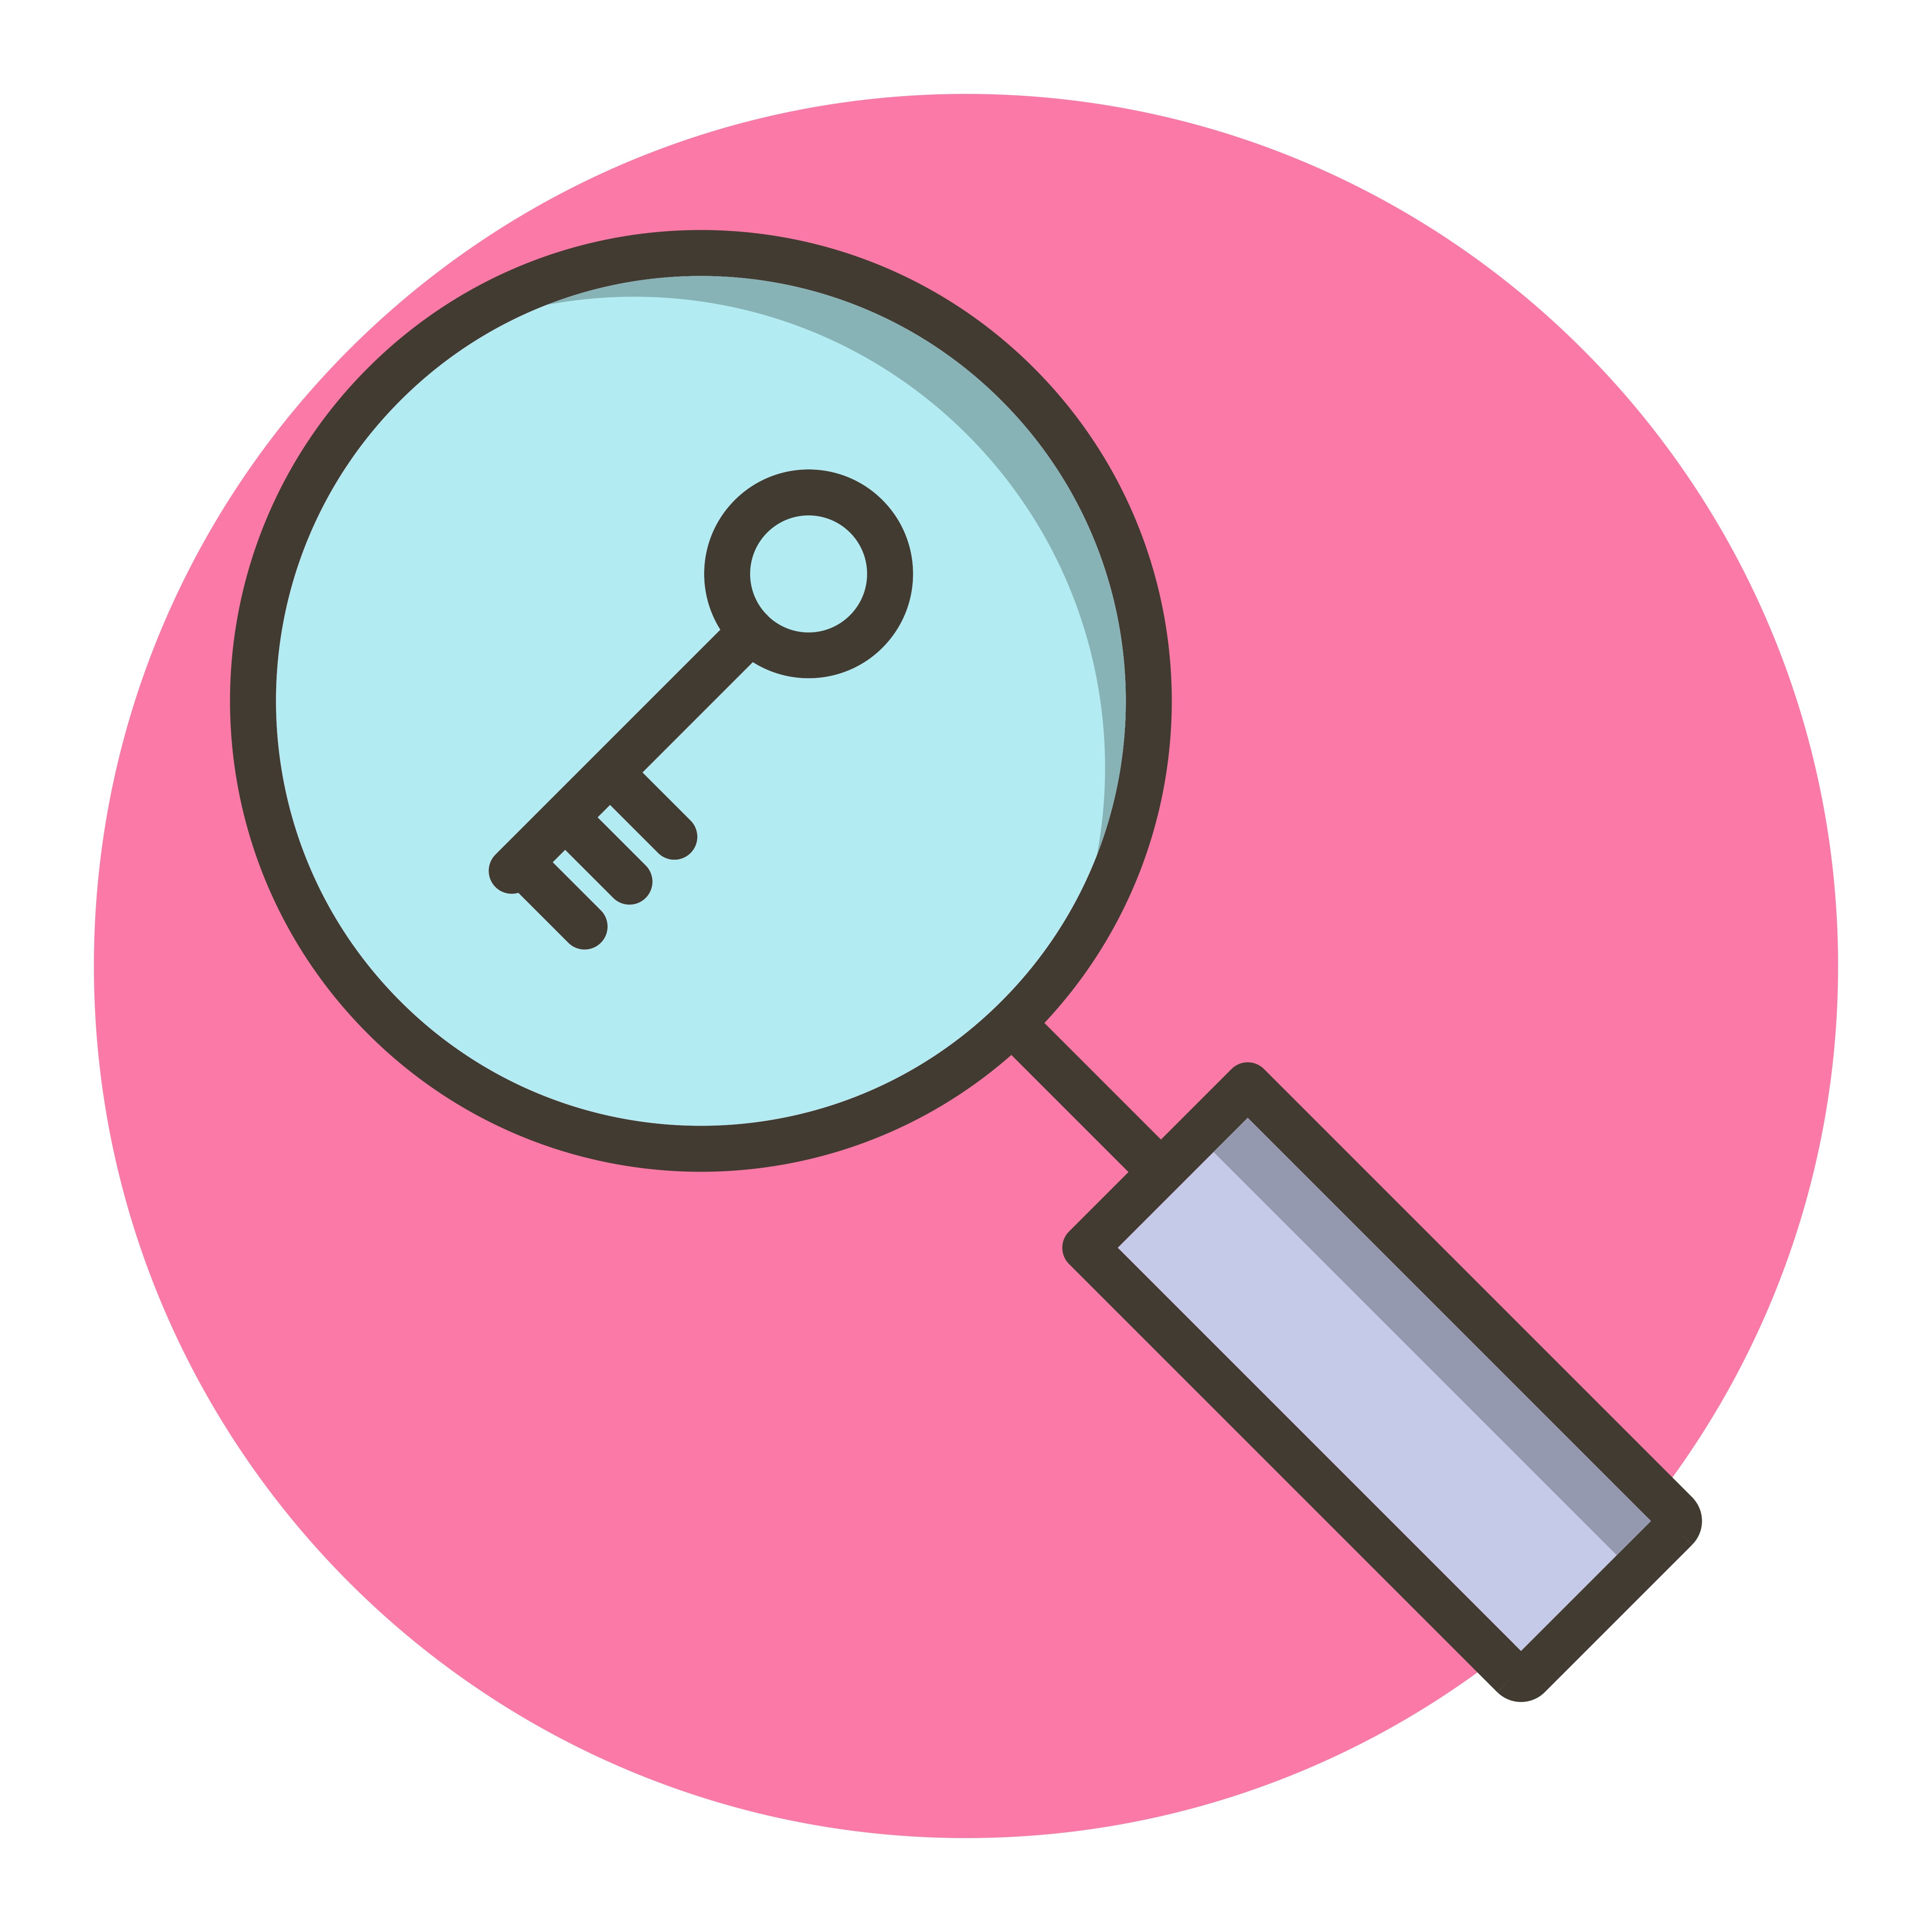 Keyword Search Icon Design 491222 - Download Free Vectors, Clipart Graphics & Vector Art